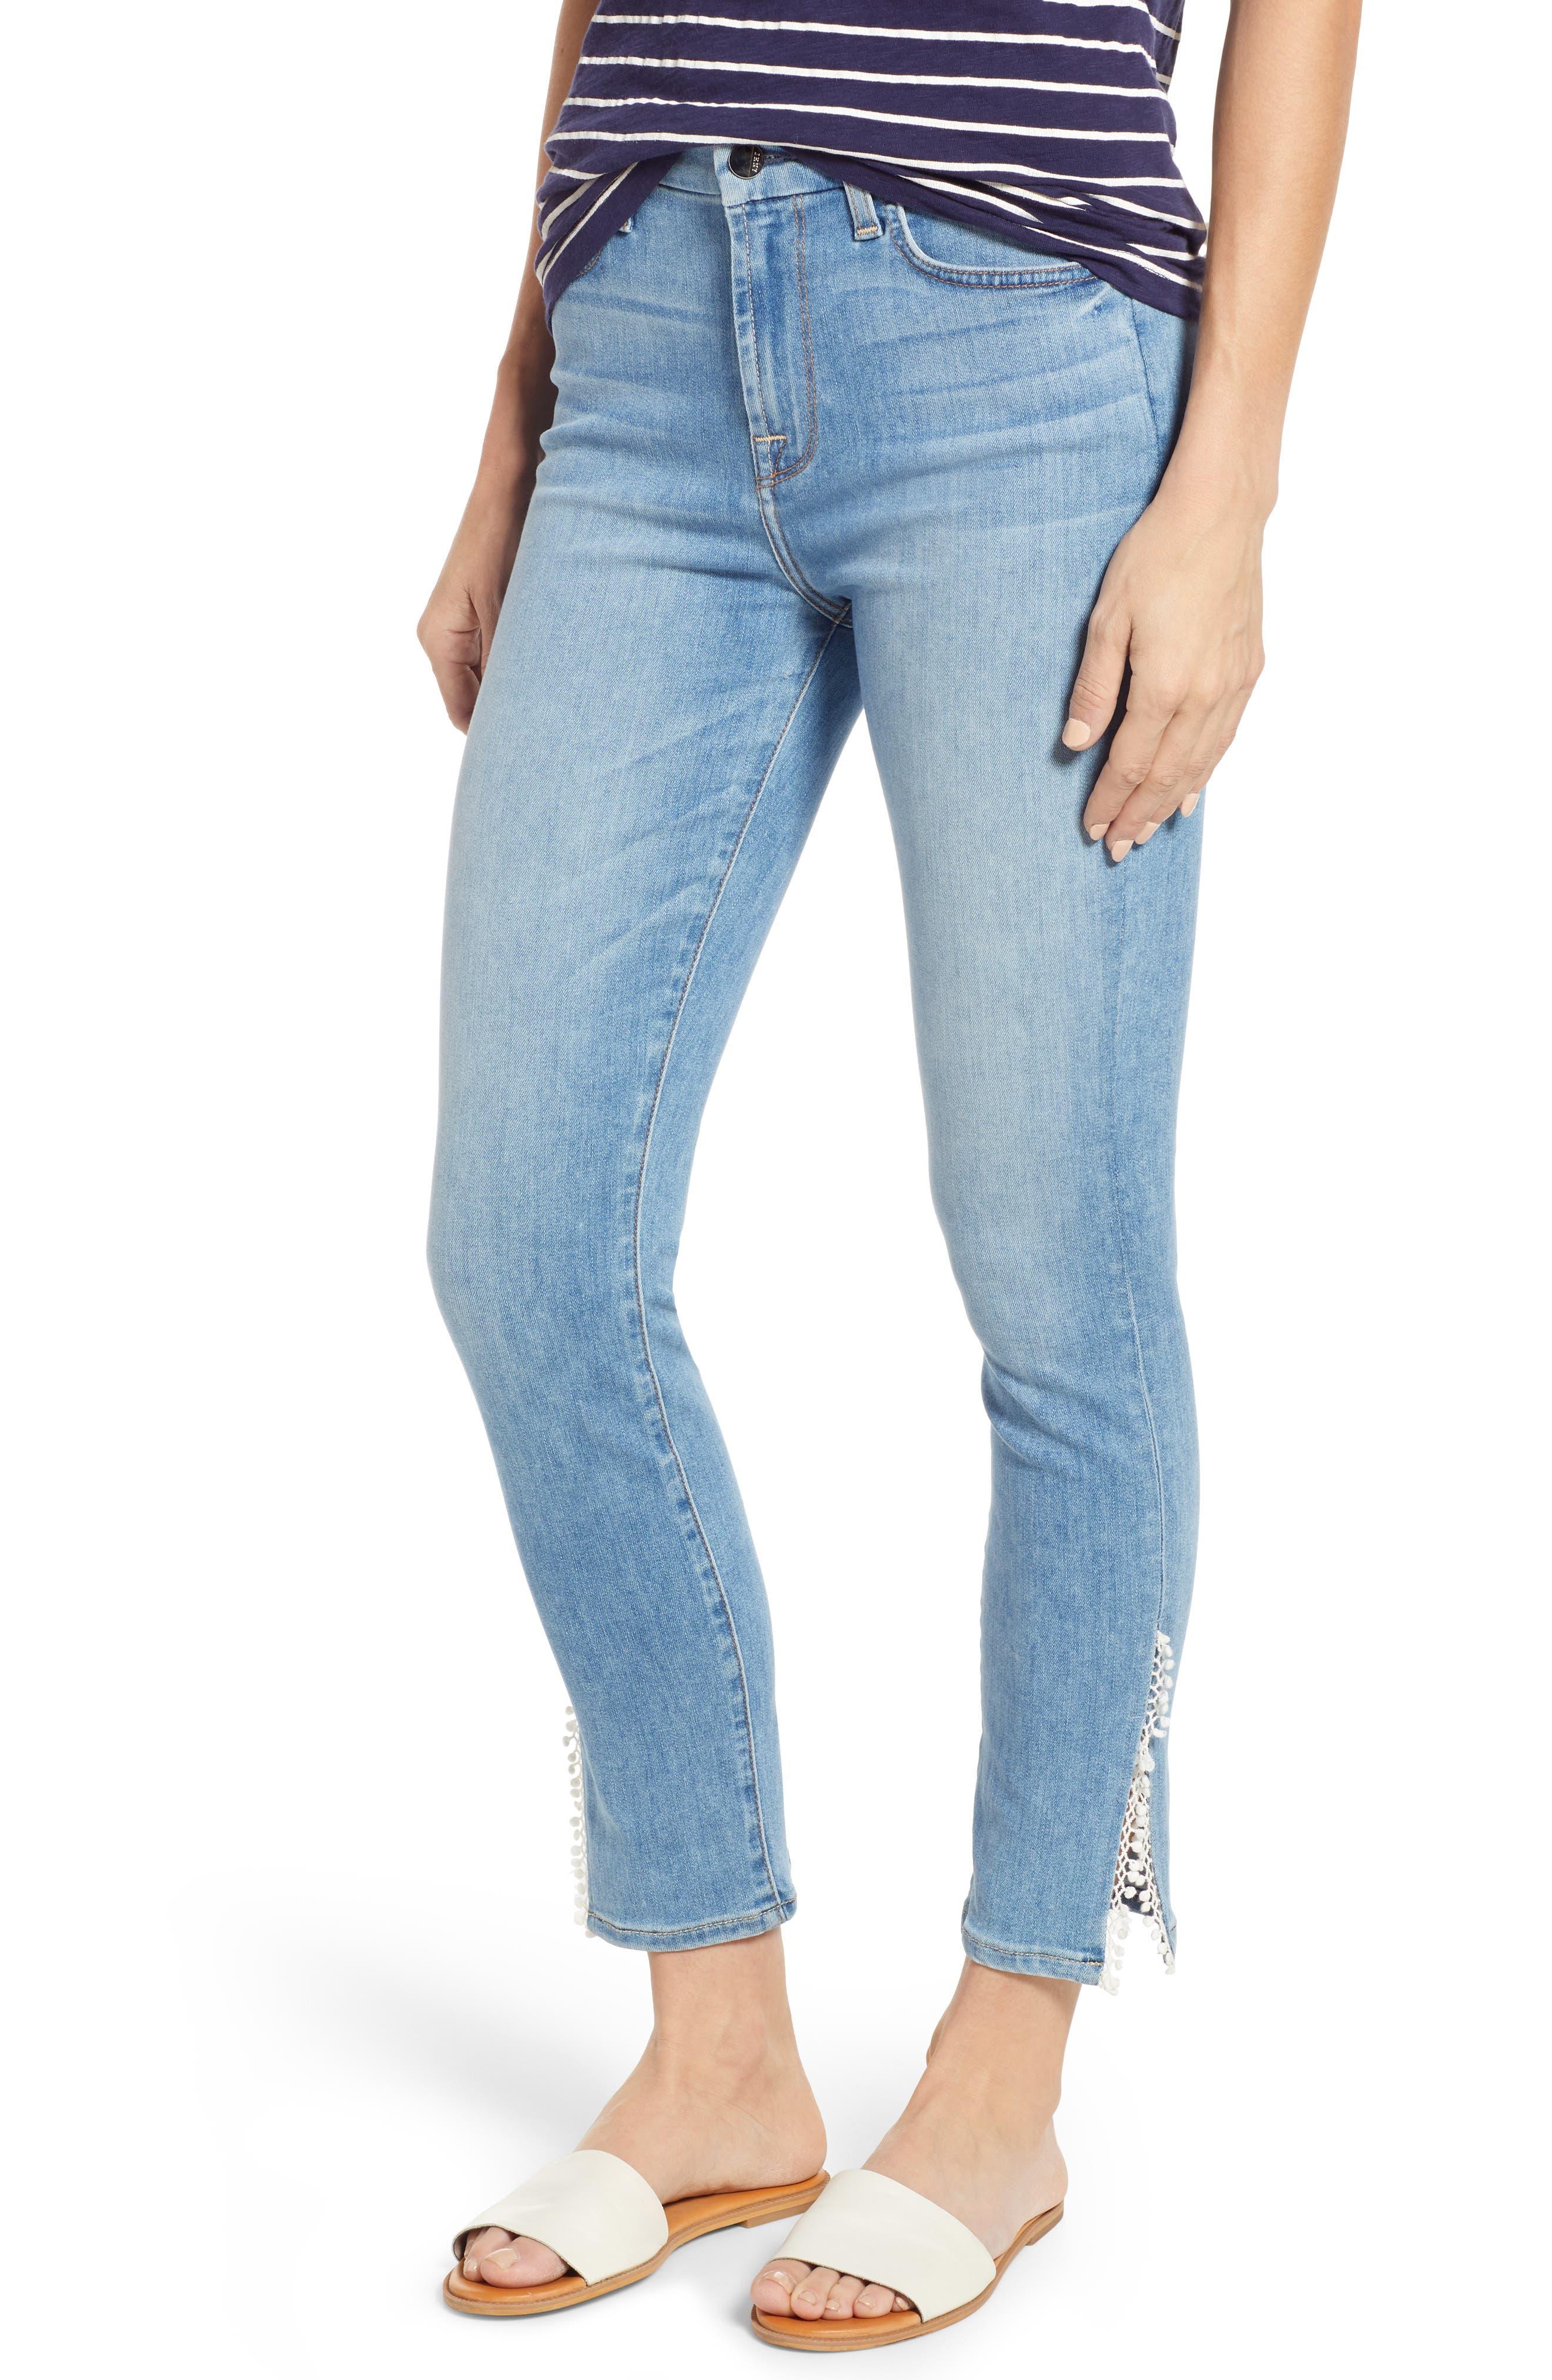 JEN7 BY 7 FOR ALL MANKIND, Pompom Detail Crop Skinny Jeans, Main thumbnail 1, color, LA QUINTA POM POM